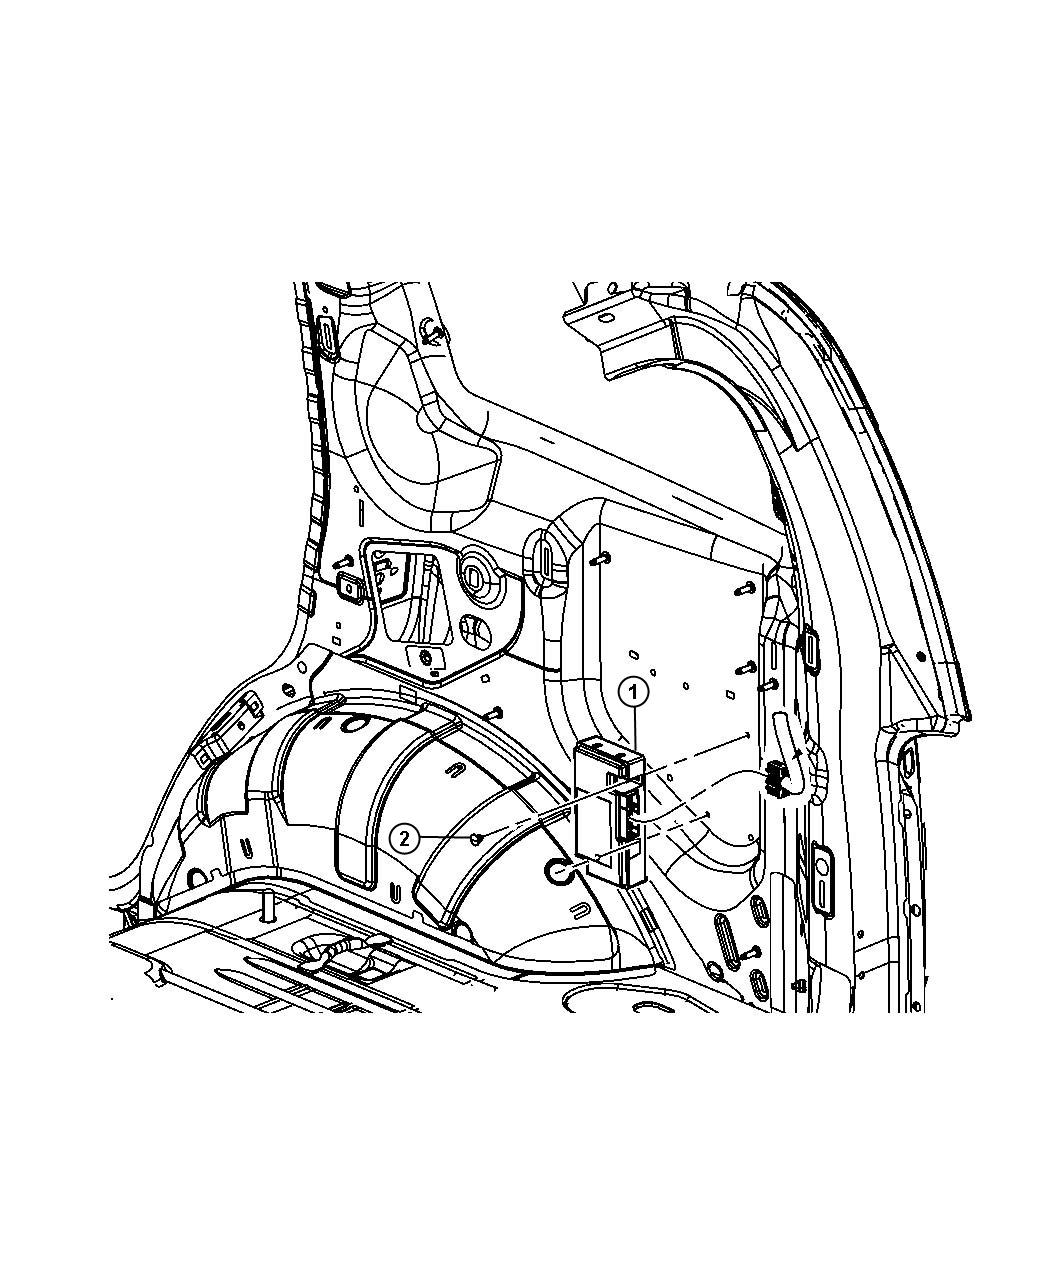 2012 Jeep Liberty Module. Telematics. [uconnect voice